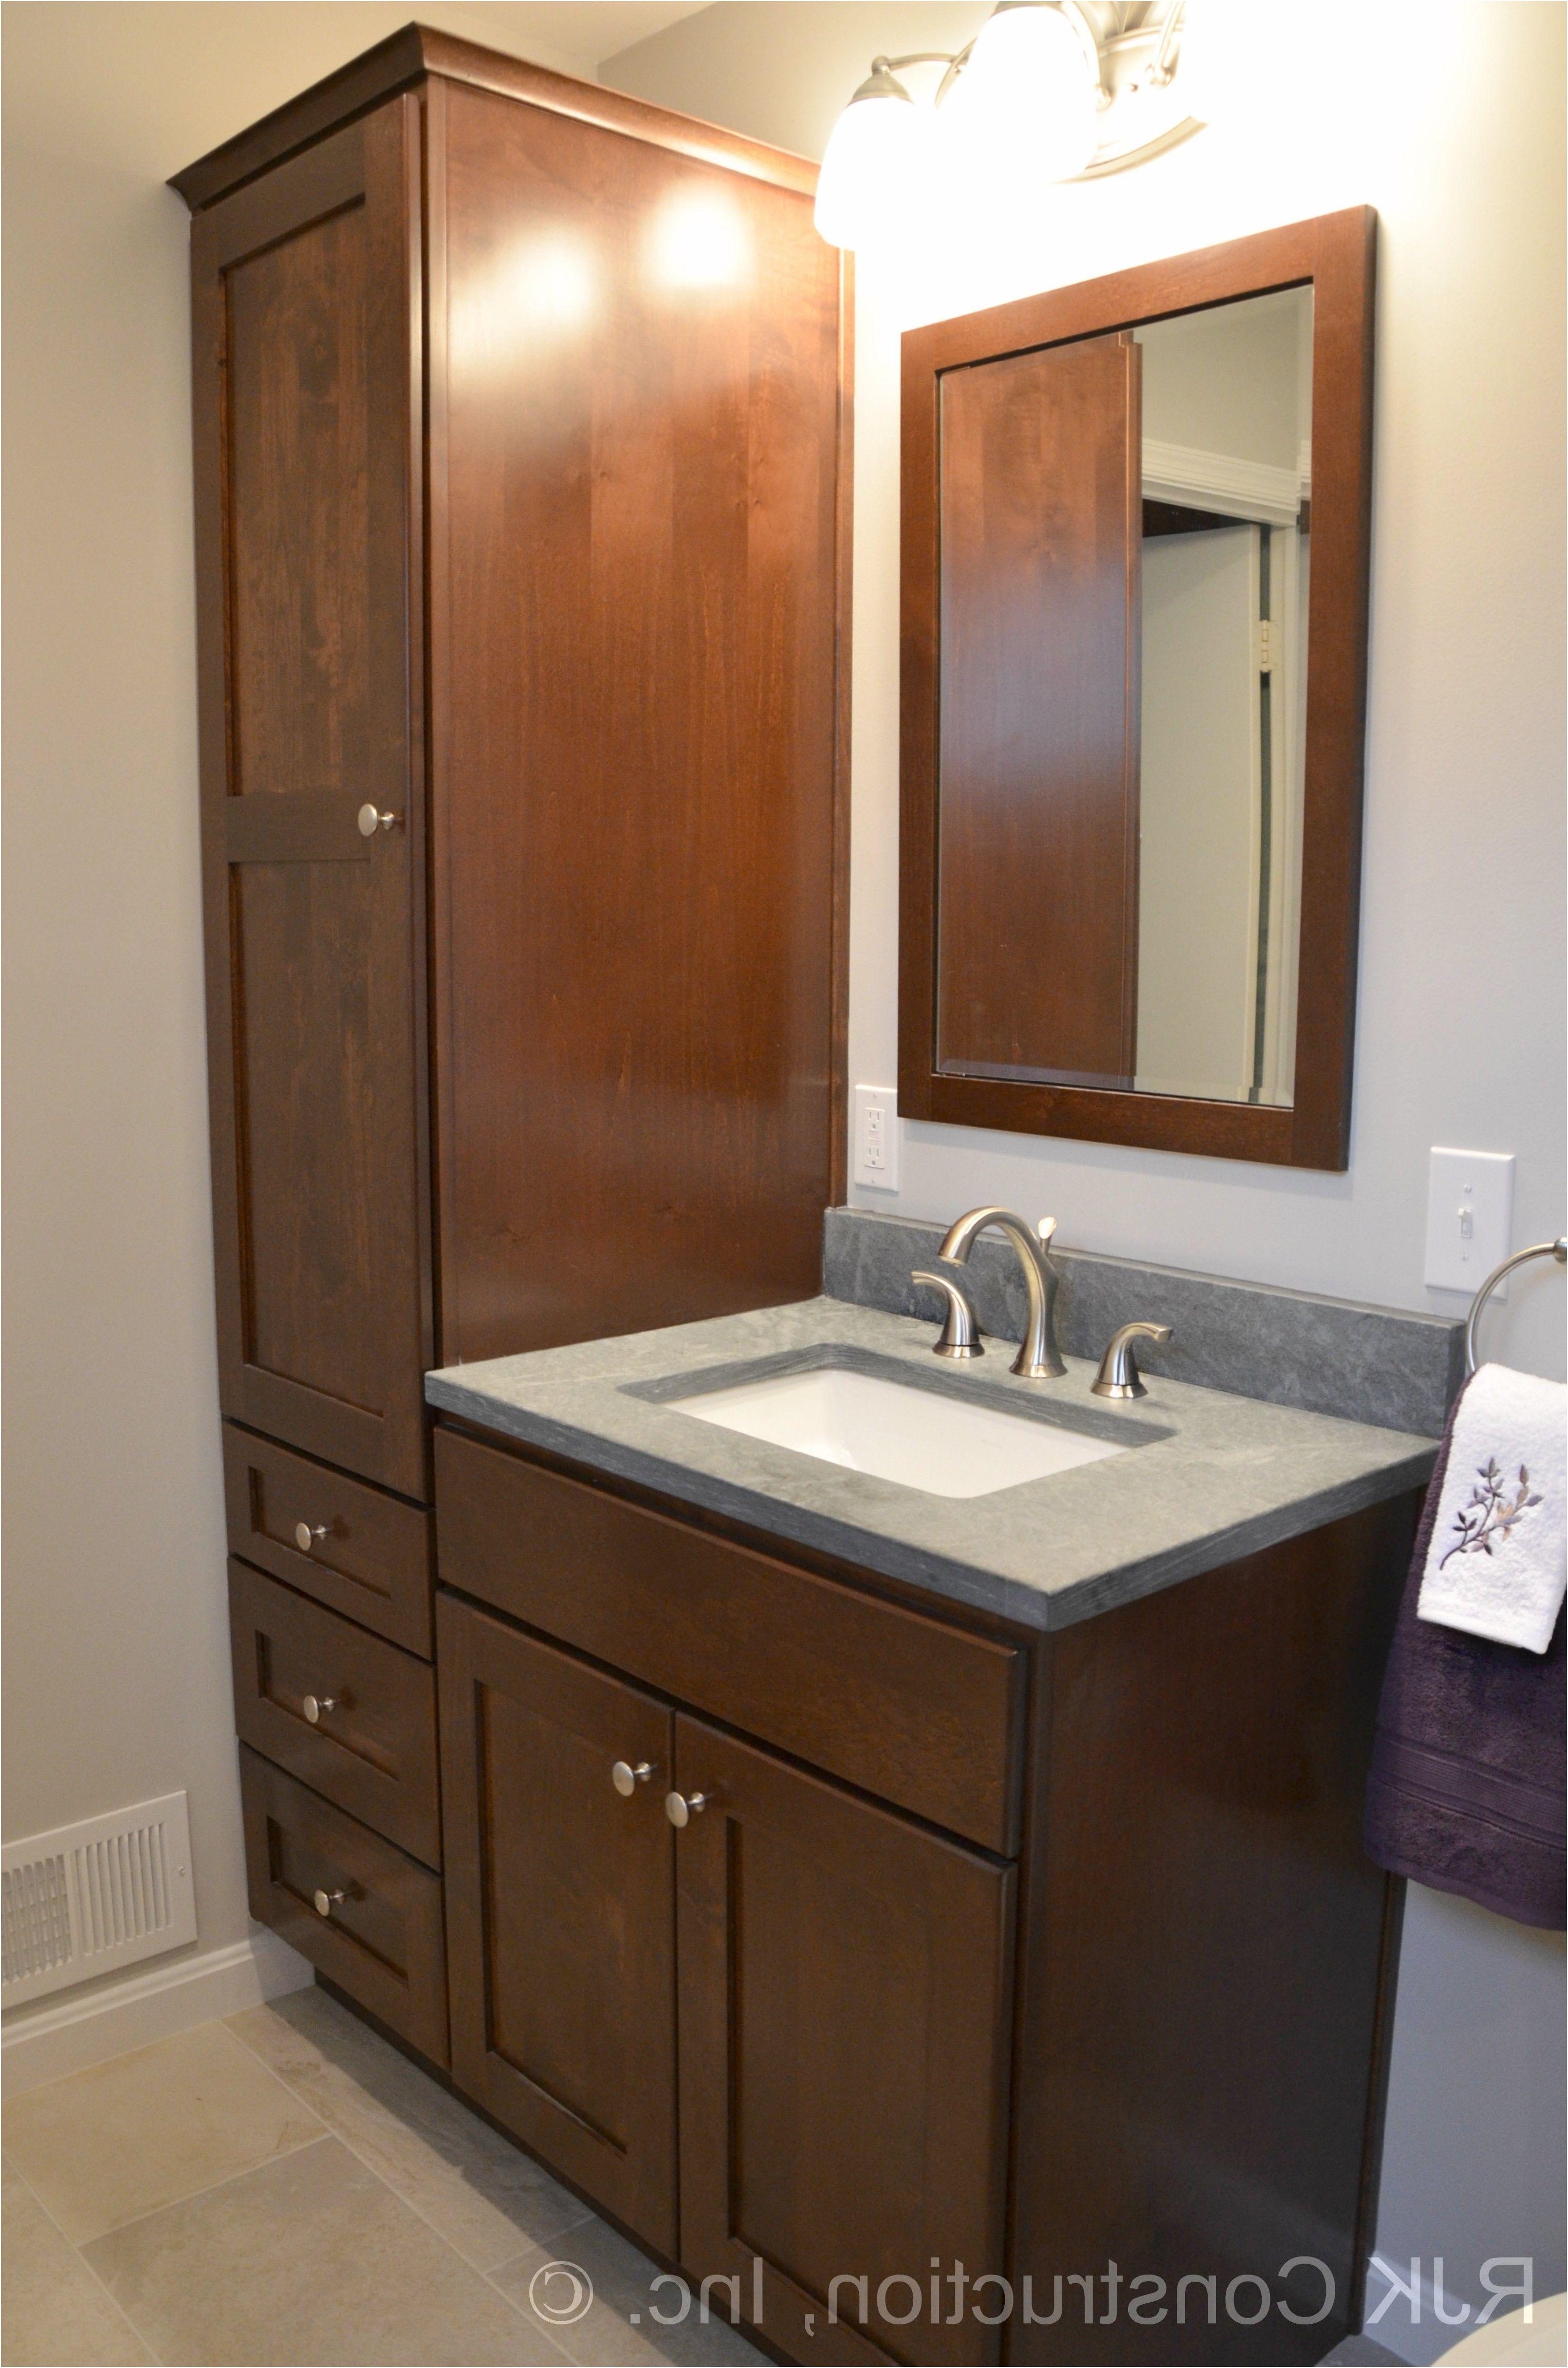 Bathroom Vanity With Side Cabinet Bathroom Cabinets From Bathroom Vanities With Side Cabinets